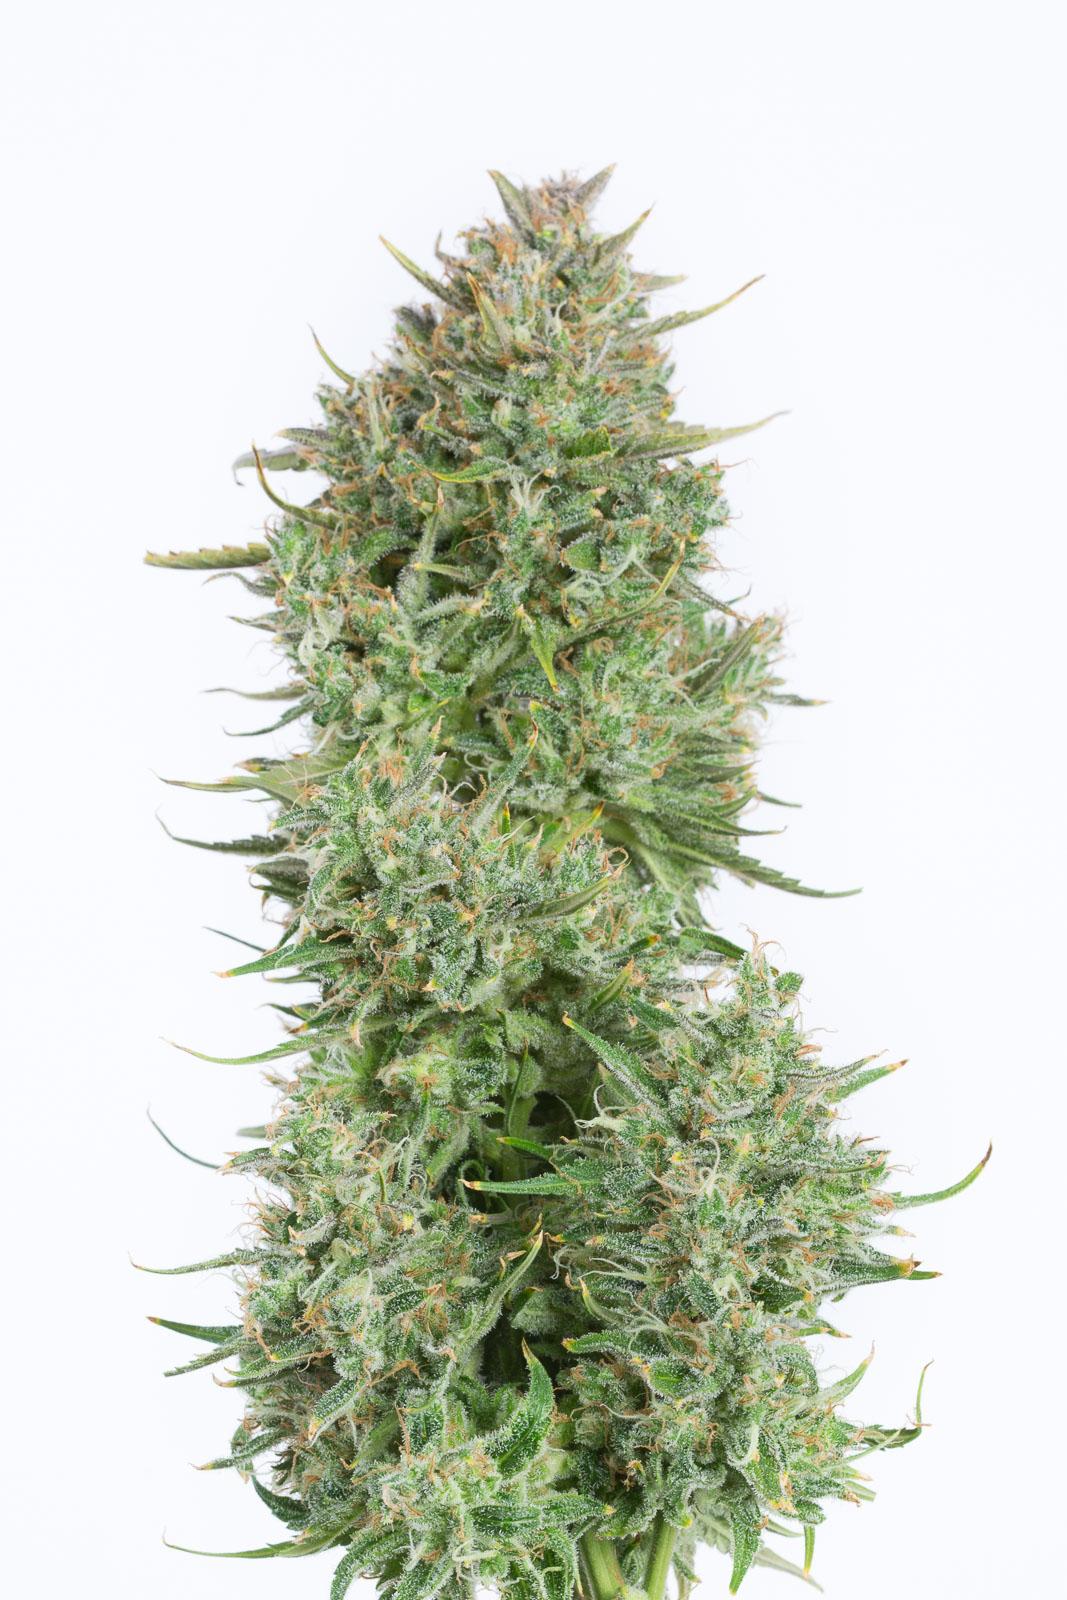 Blue Kush Autoflowering Buy Blue Kush Auto Cannabis Seeds